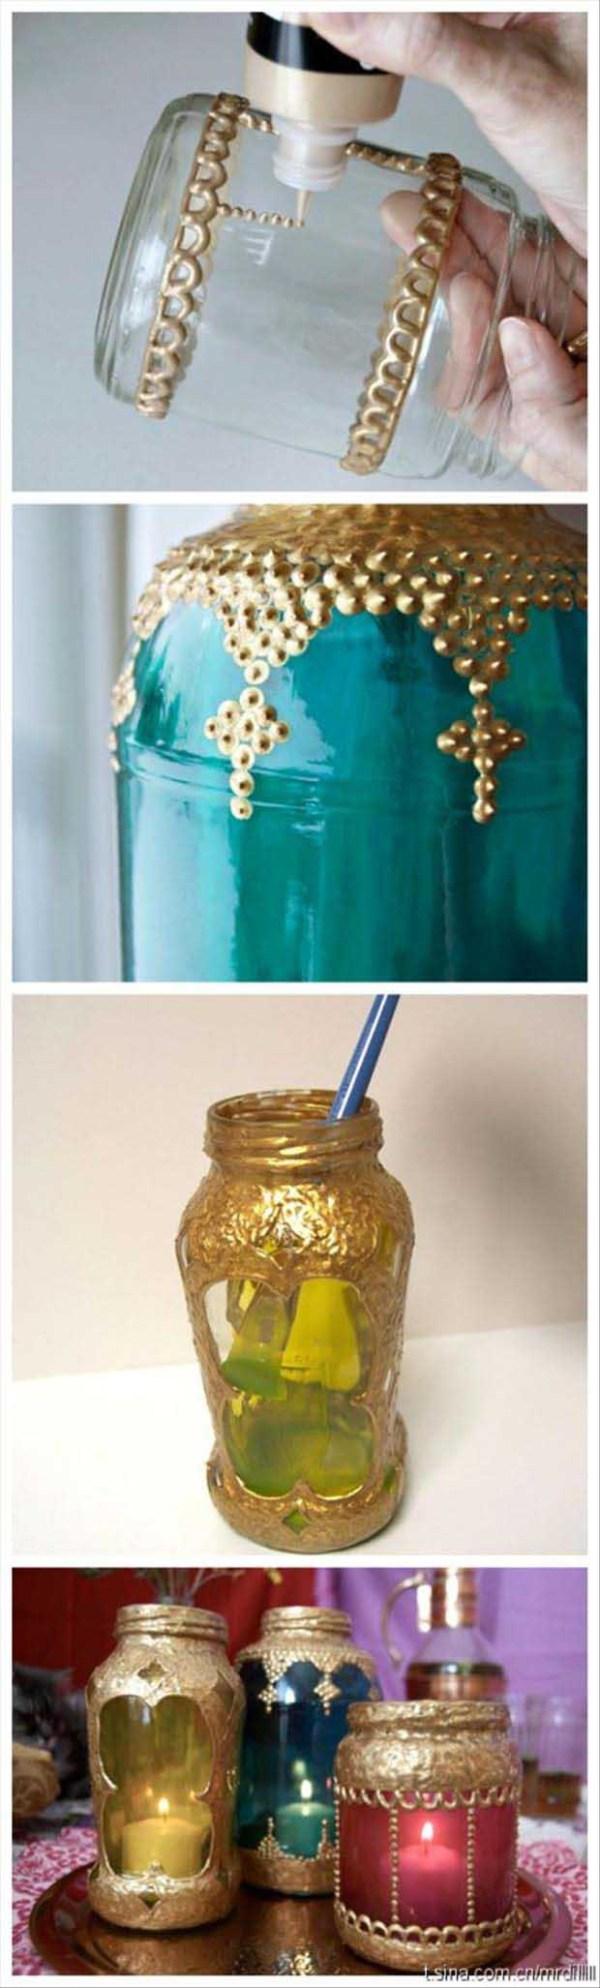 craft ideas (5)